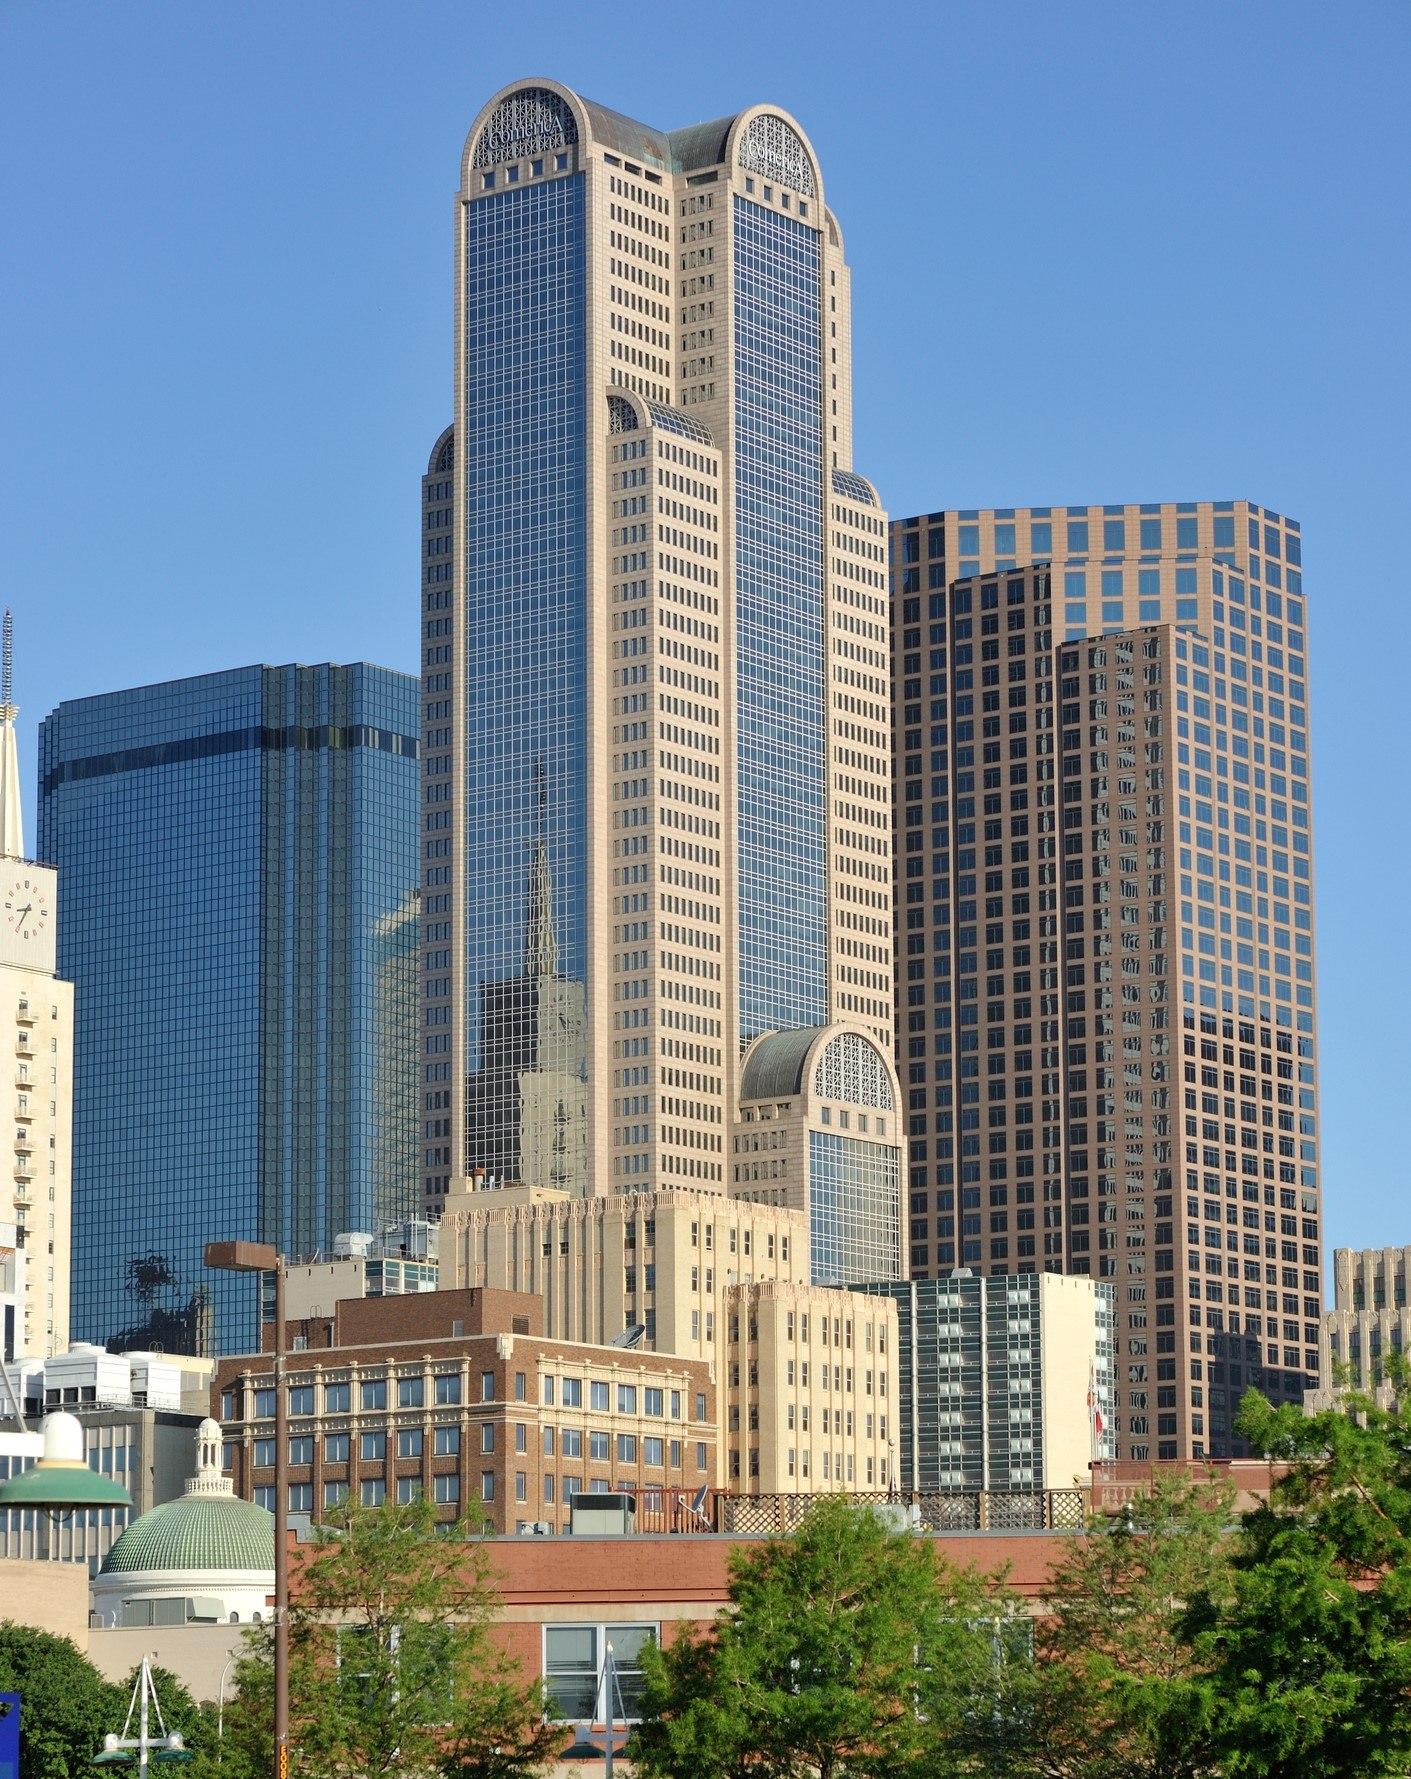 Comerica bank tower in Dallas,Texas